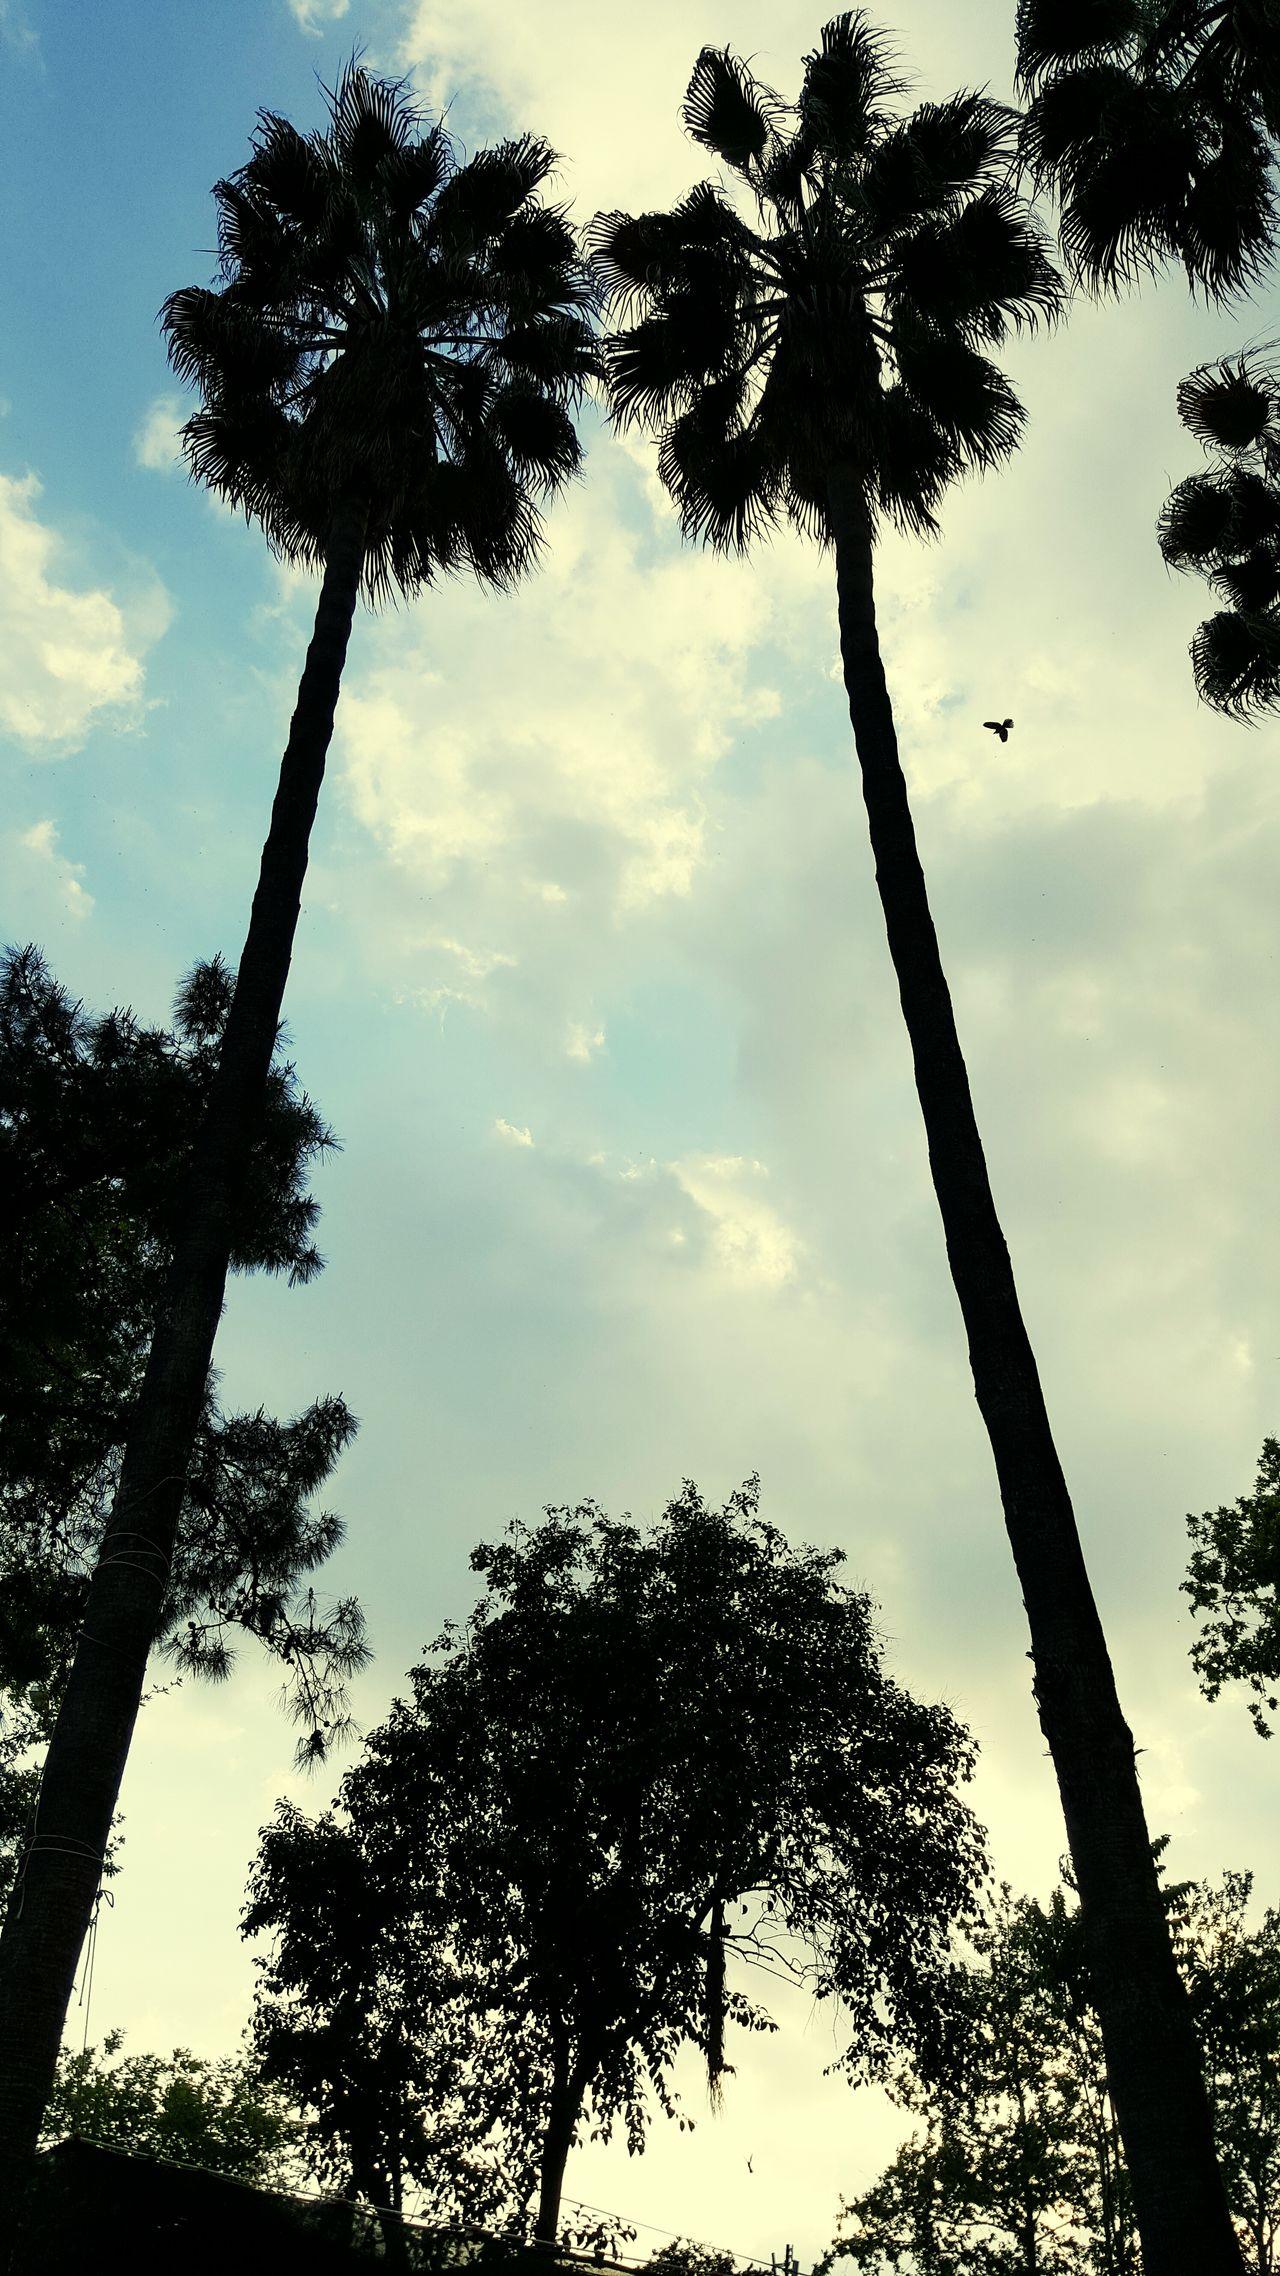 Palmiye Palm Palm Trees Palm Tree Savrun çayı Runnel Nehir Kadirli Osmaniye Adana çukurova Akdeniz Bird